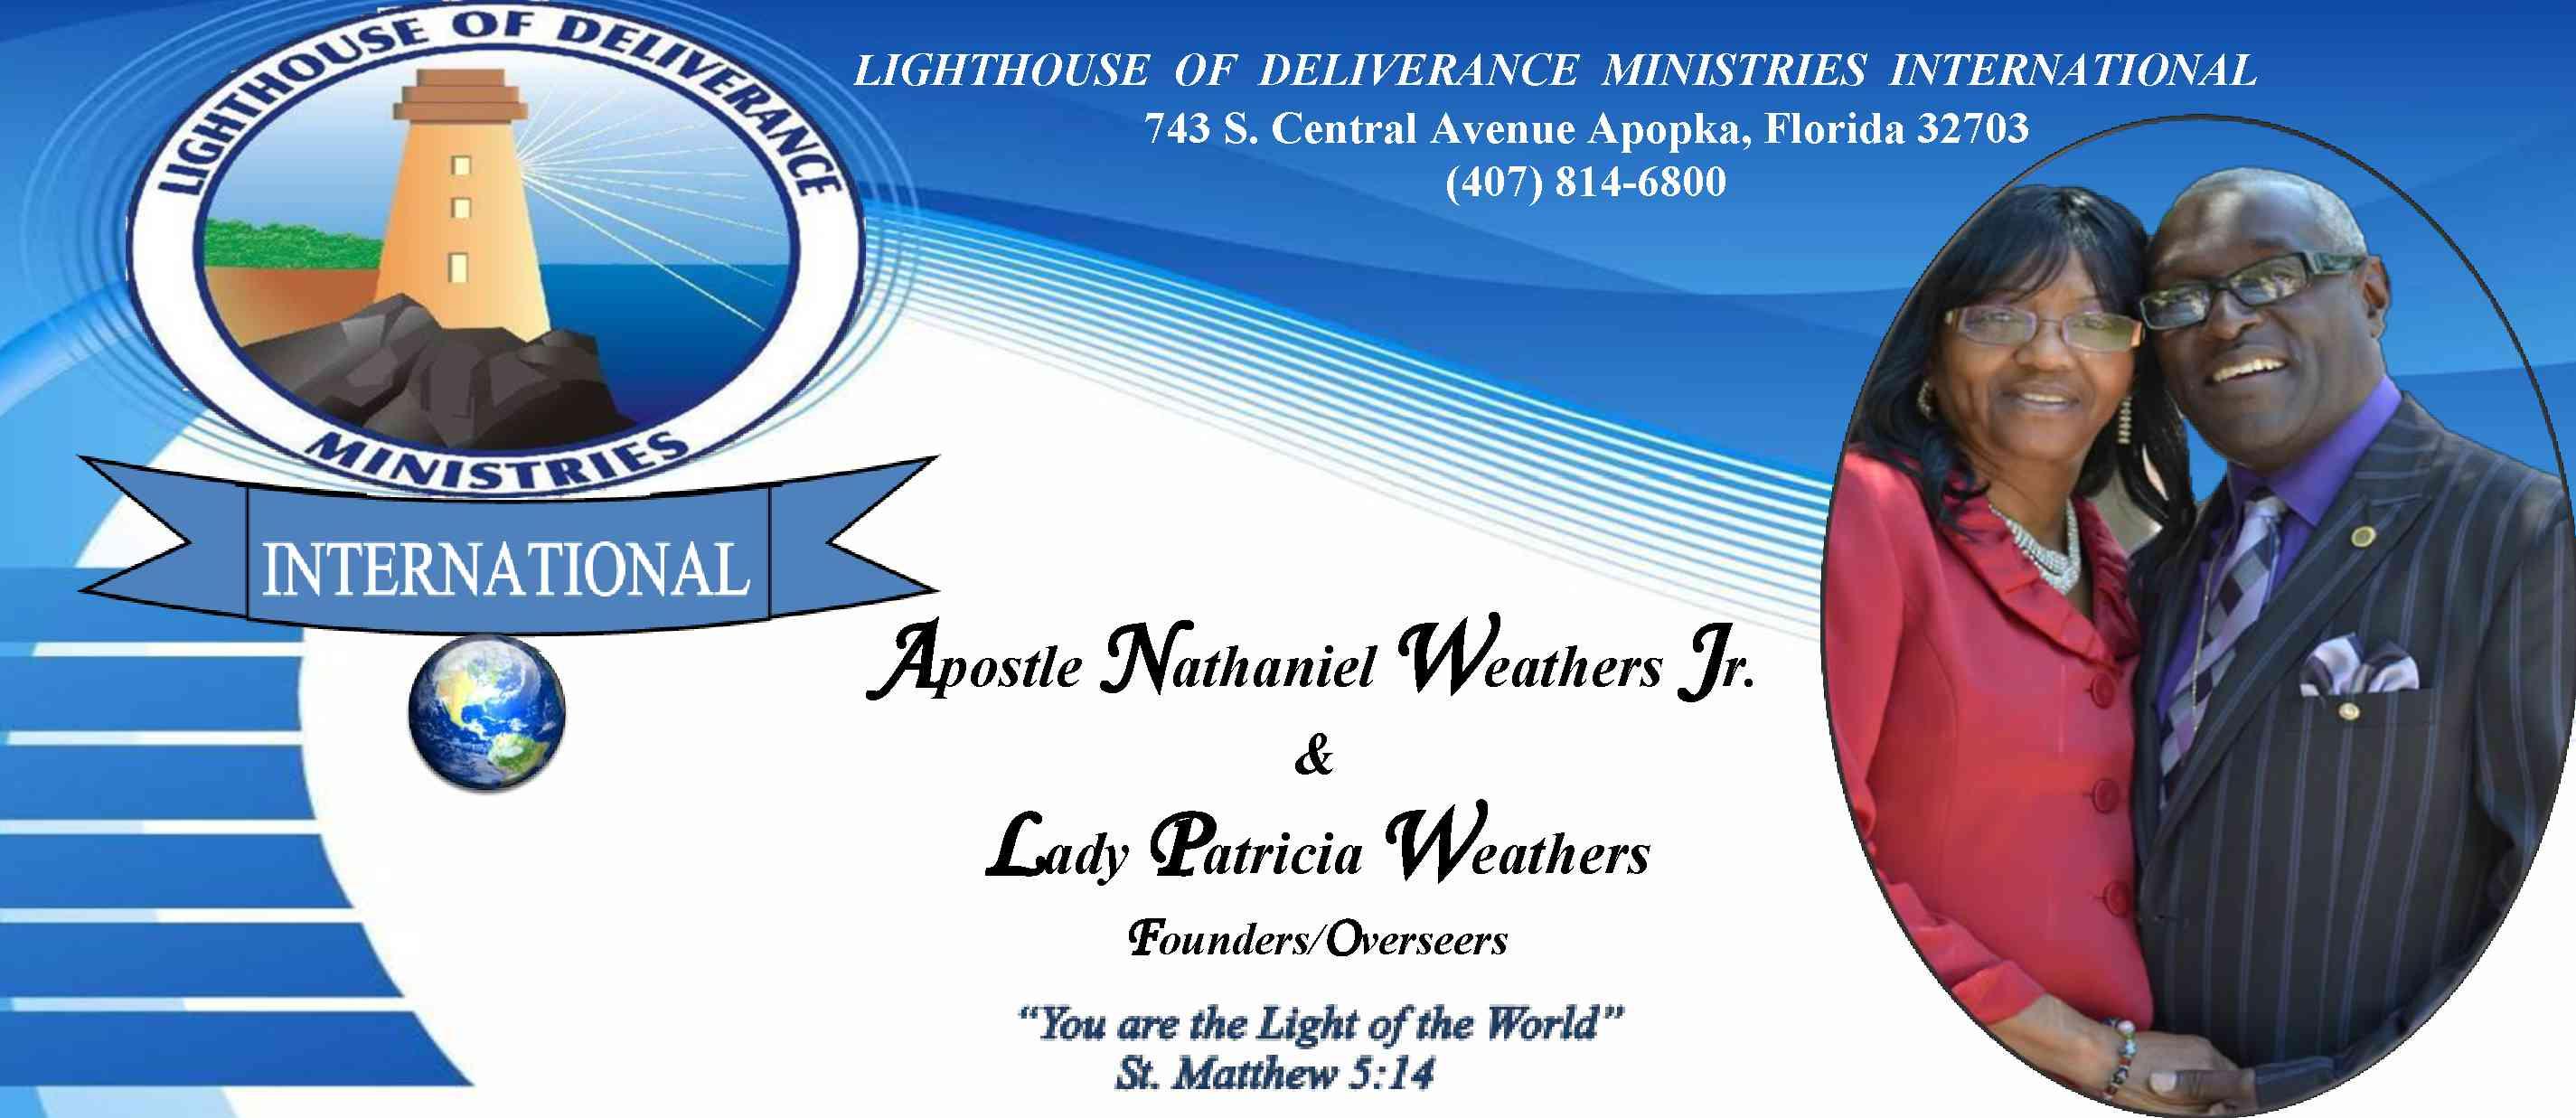 Lighthouse of Deliverance 743 S Central Ave, Apopka, FL